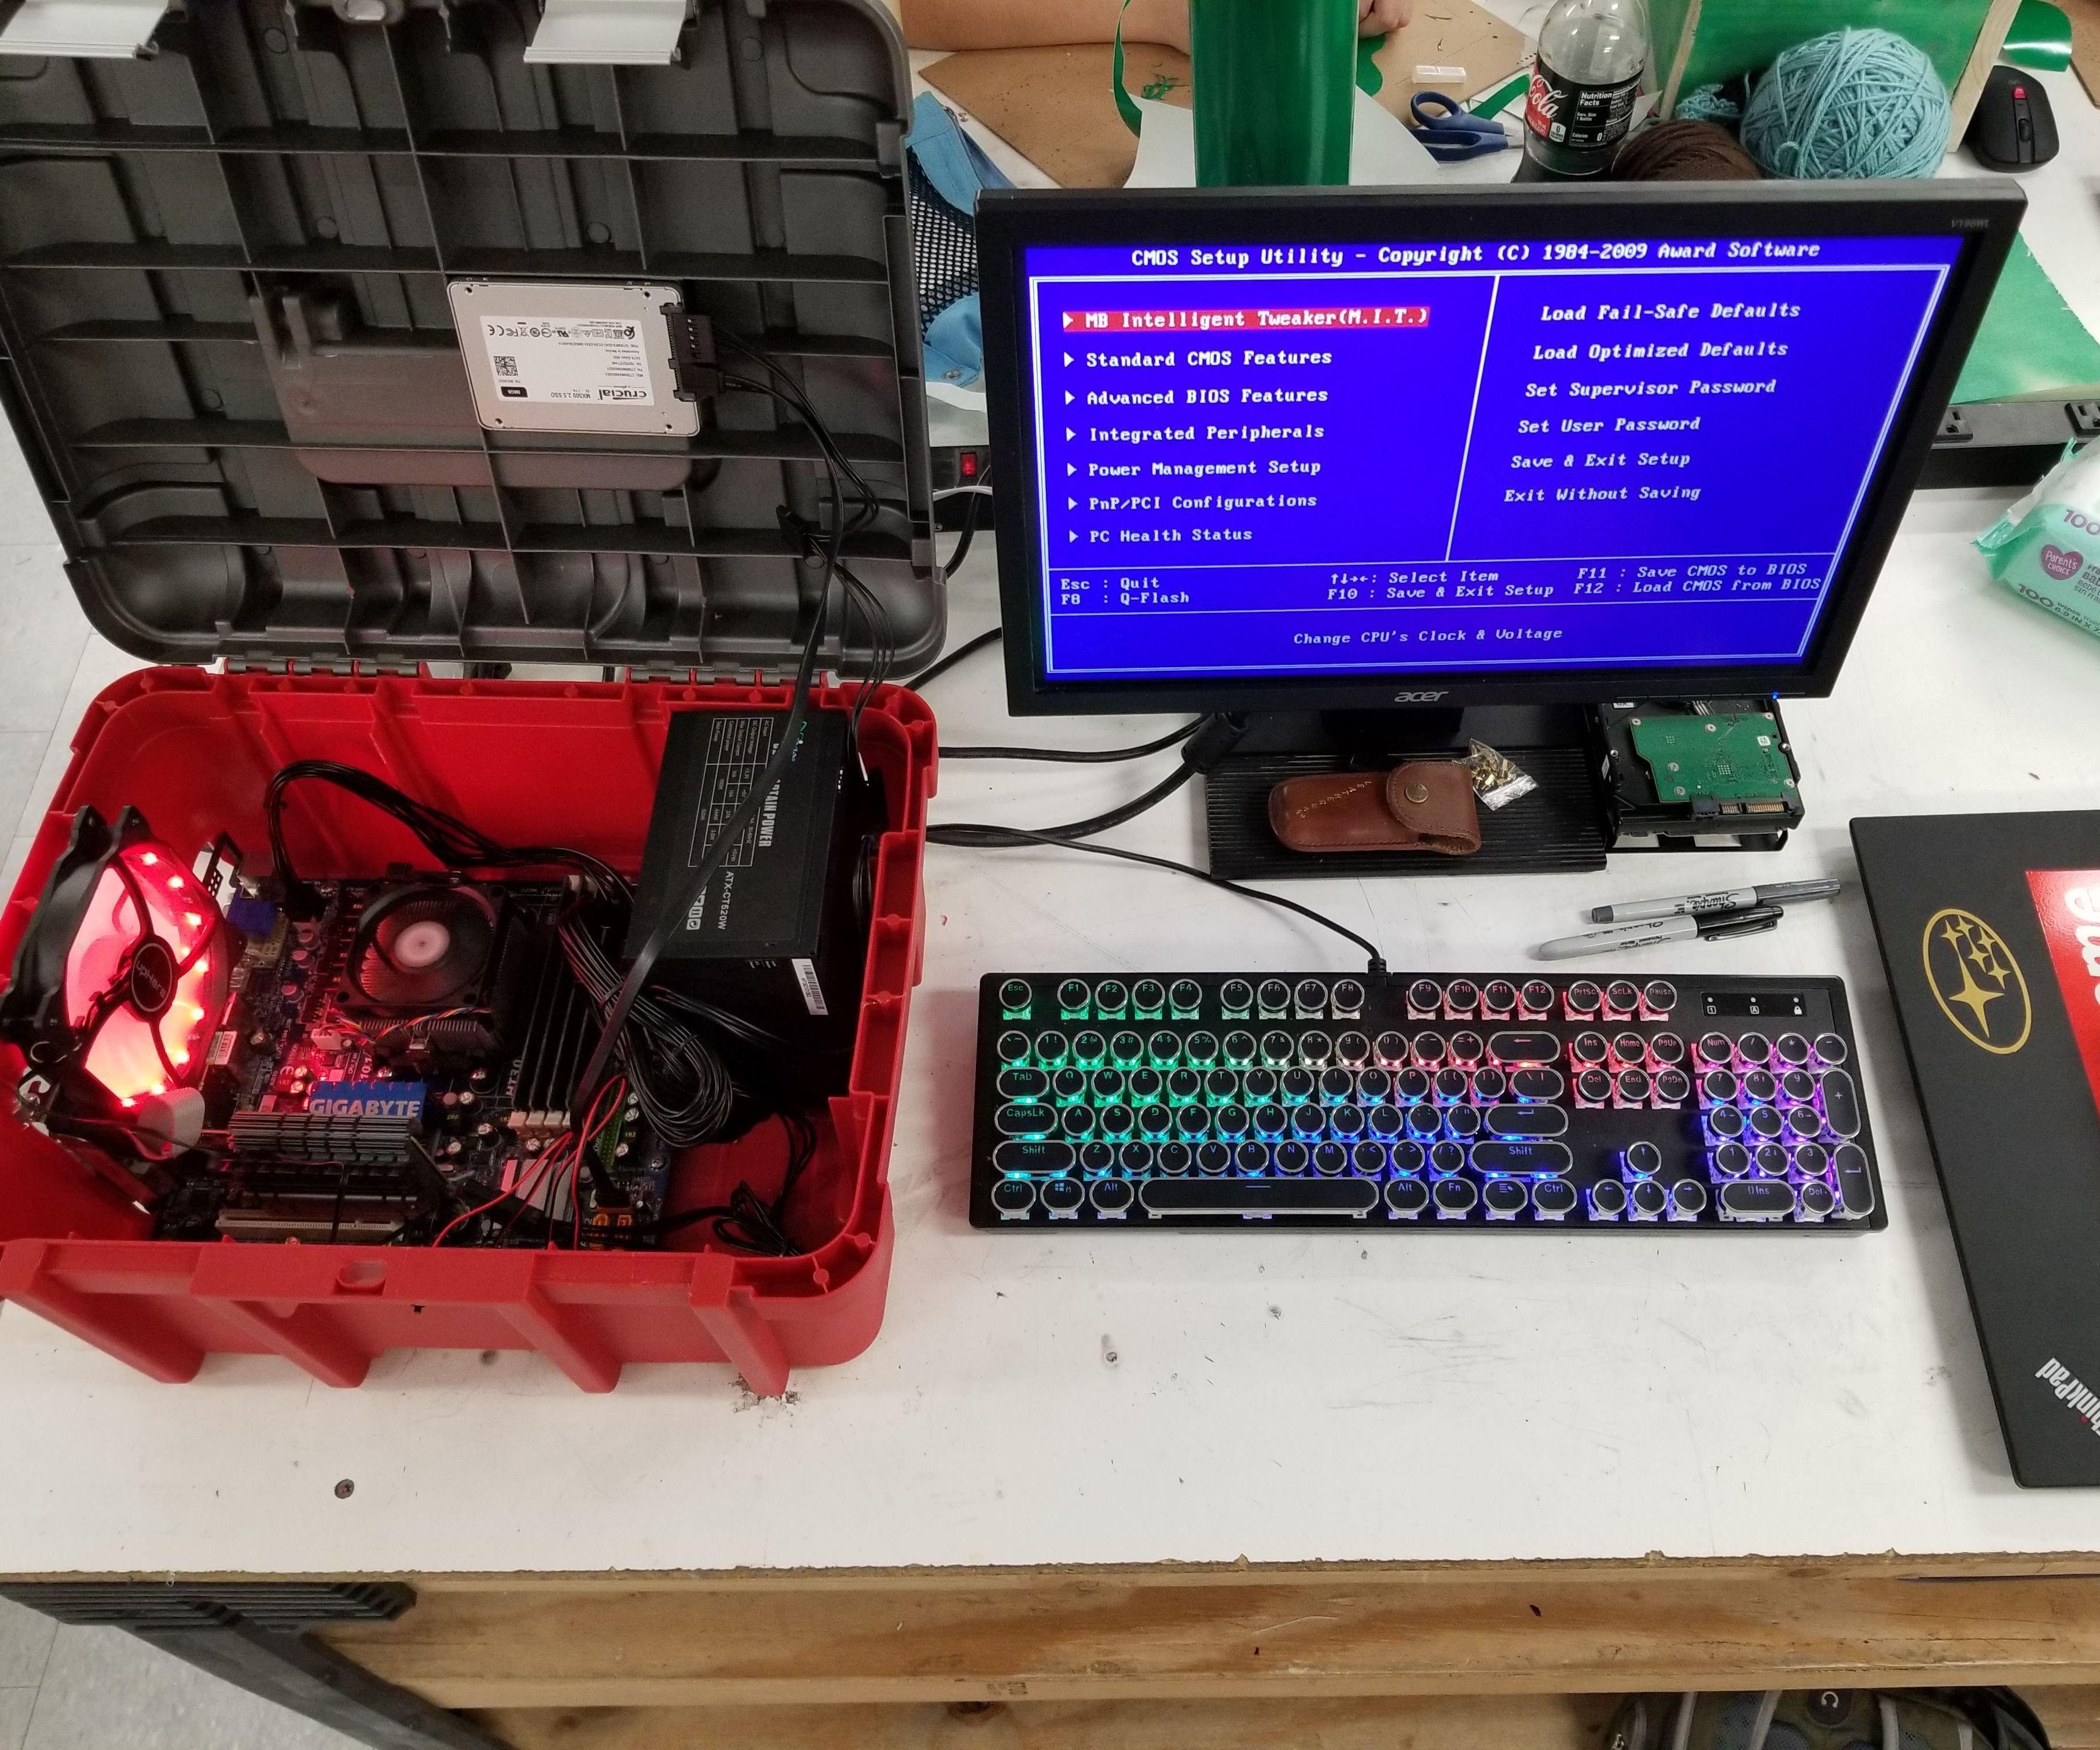 Toolbox PC